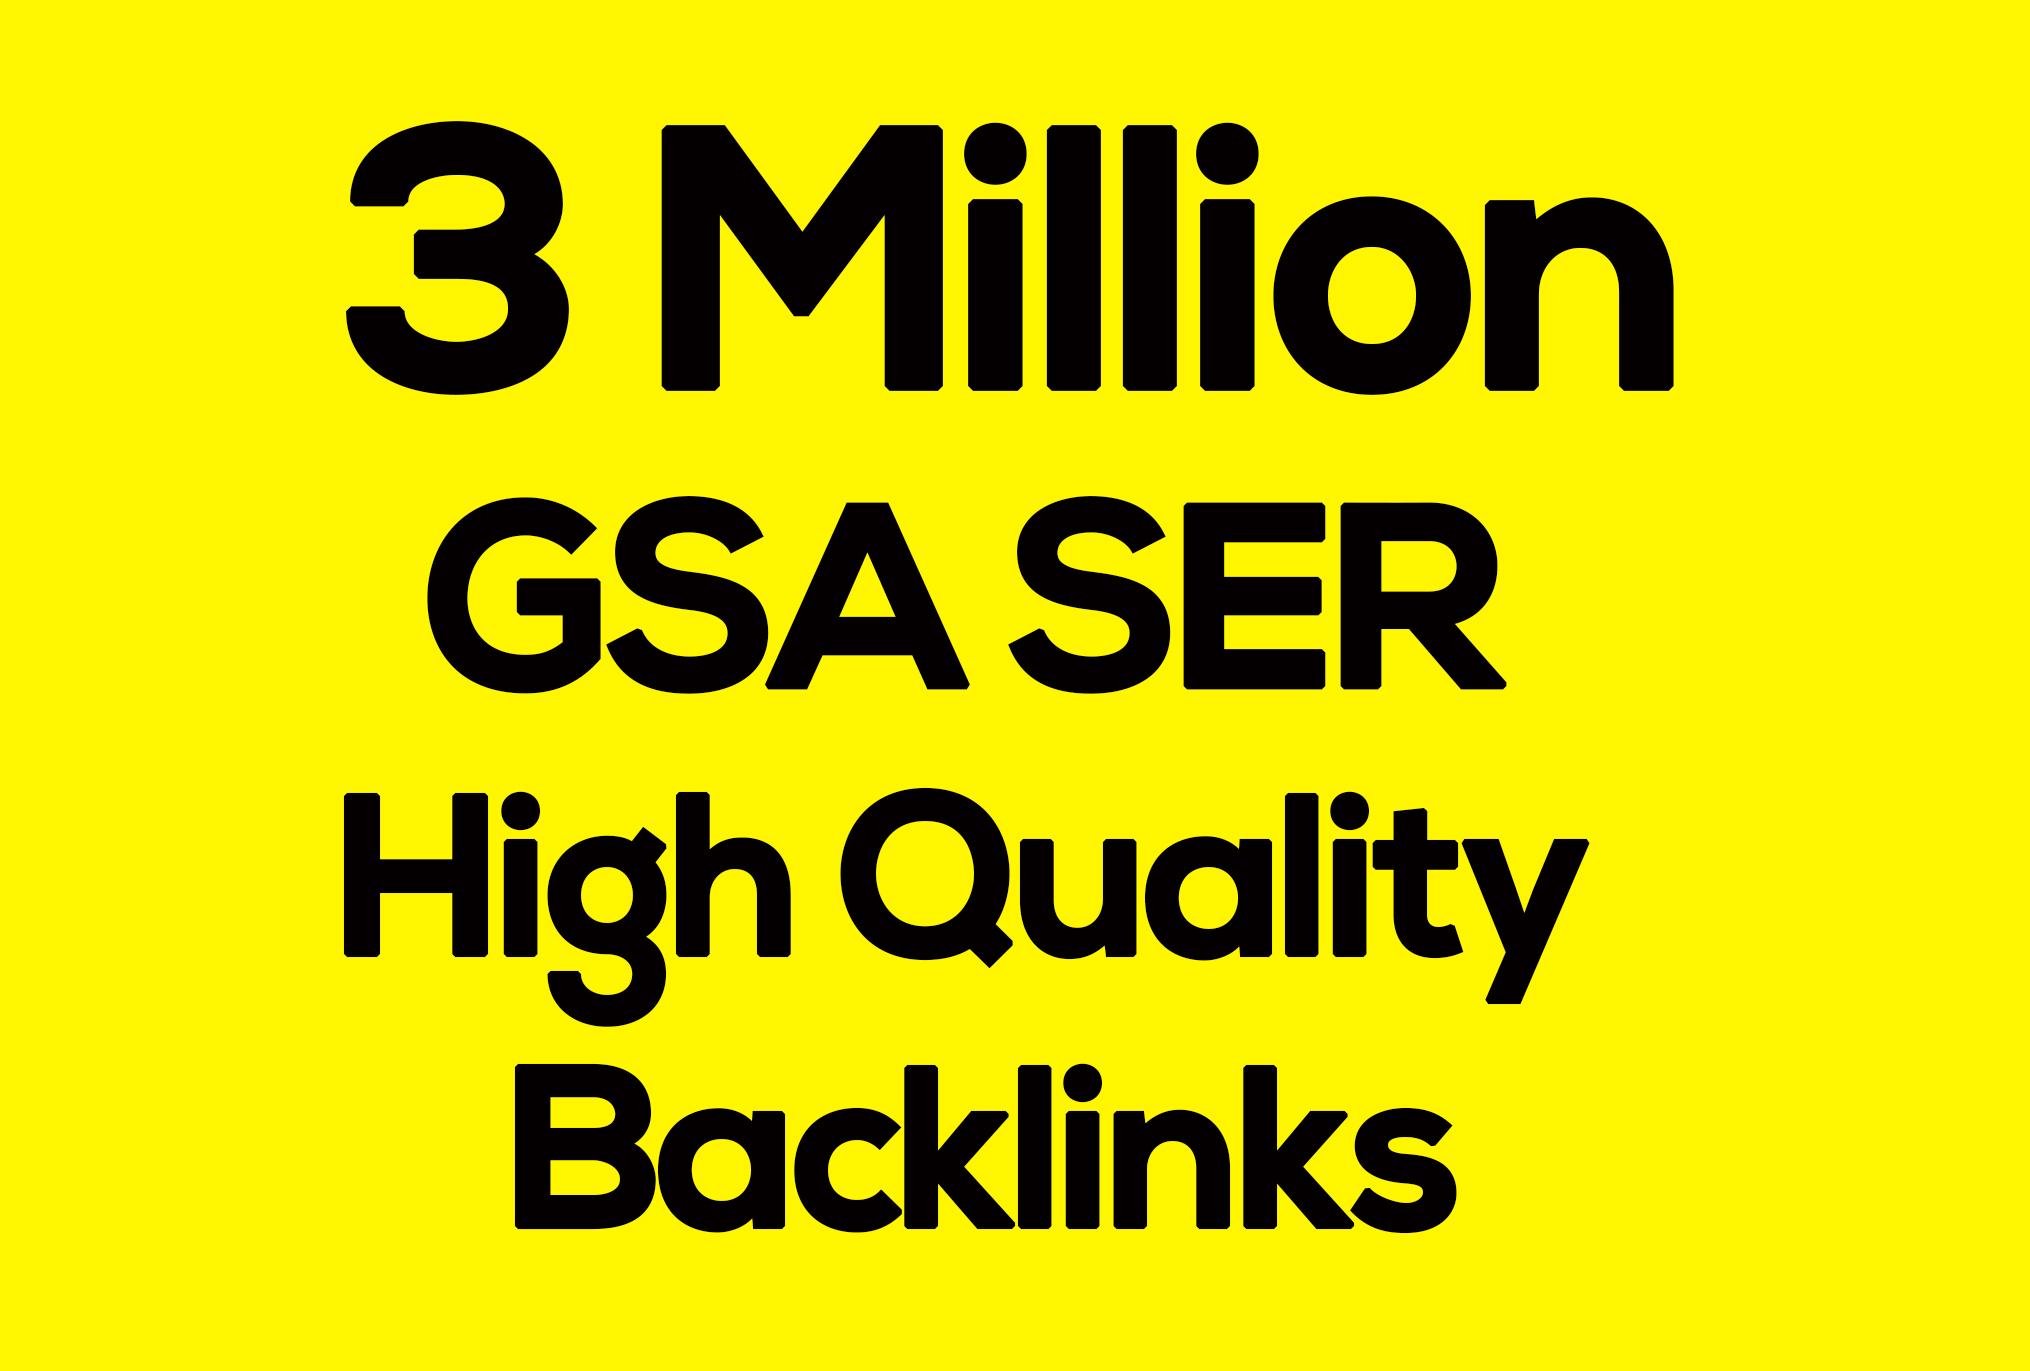 1st page 0n Google Blast 3 Million Seo Verified BACKLINKS Cracking Gsa Ser